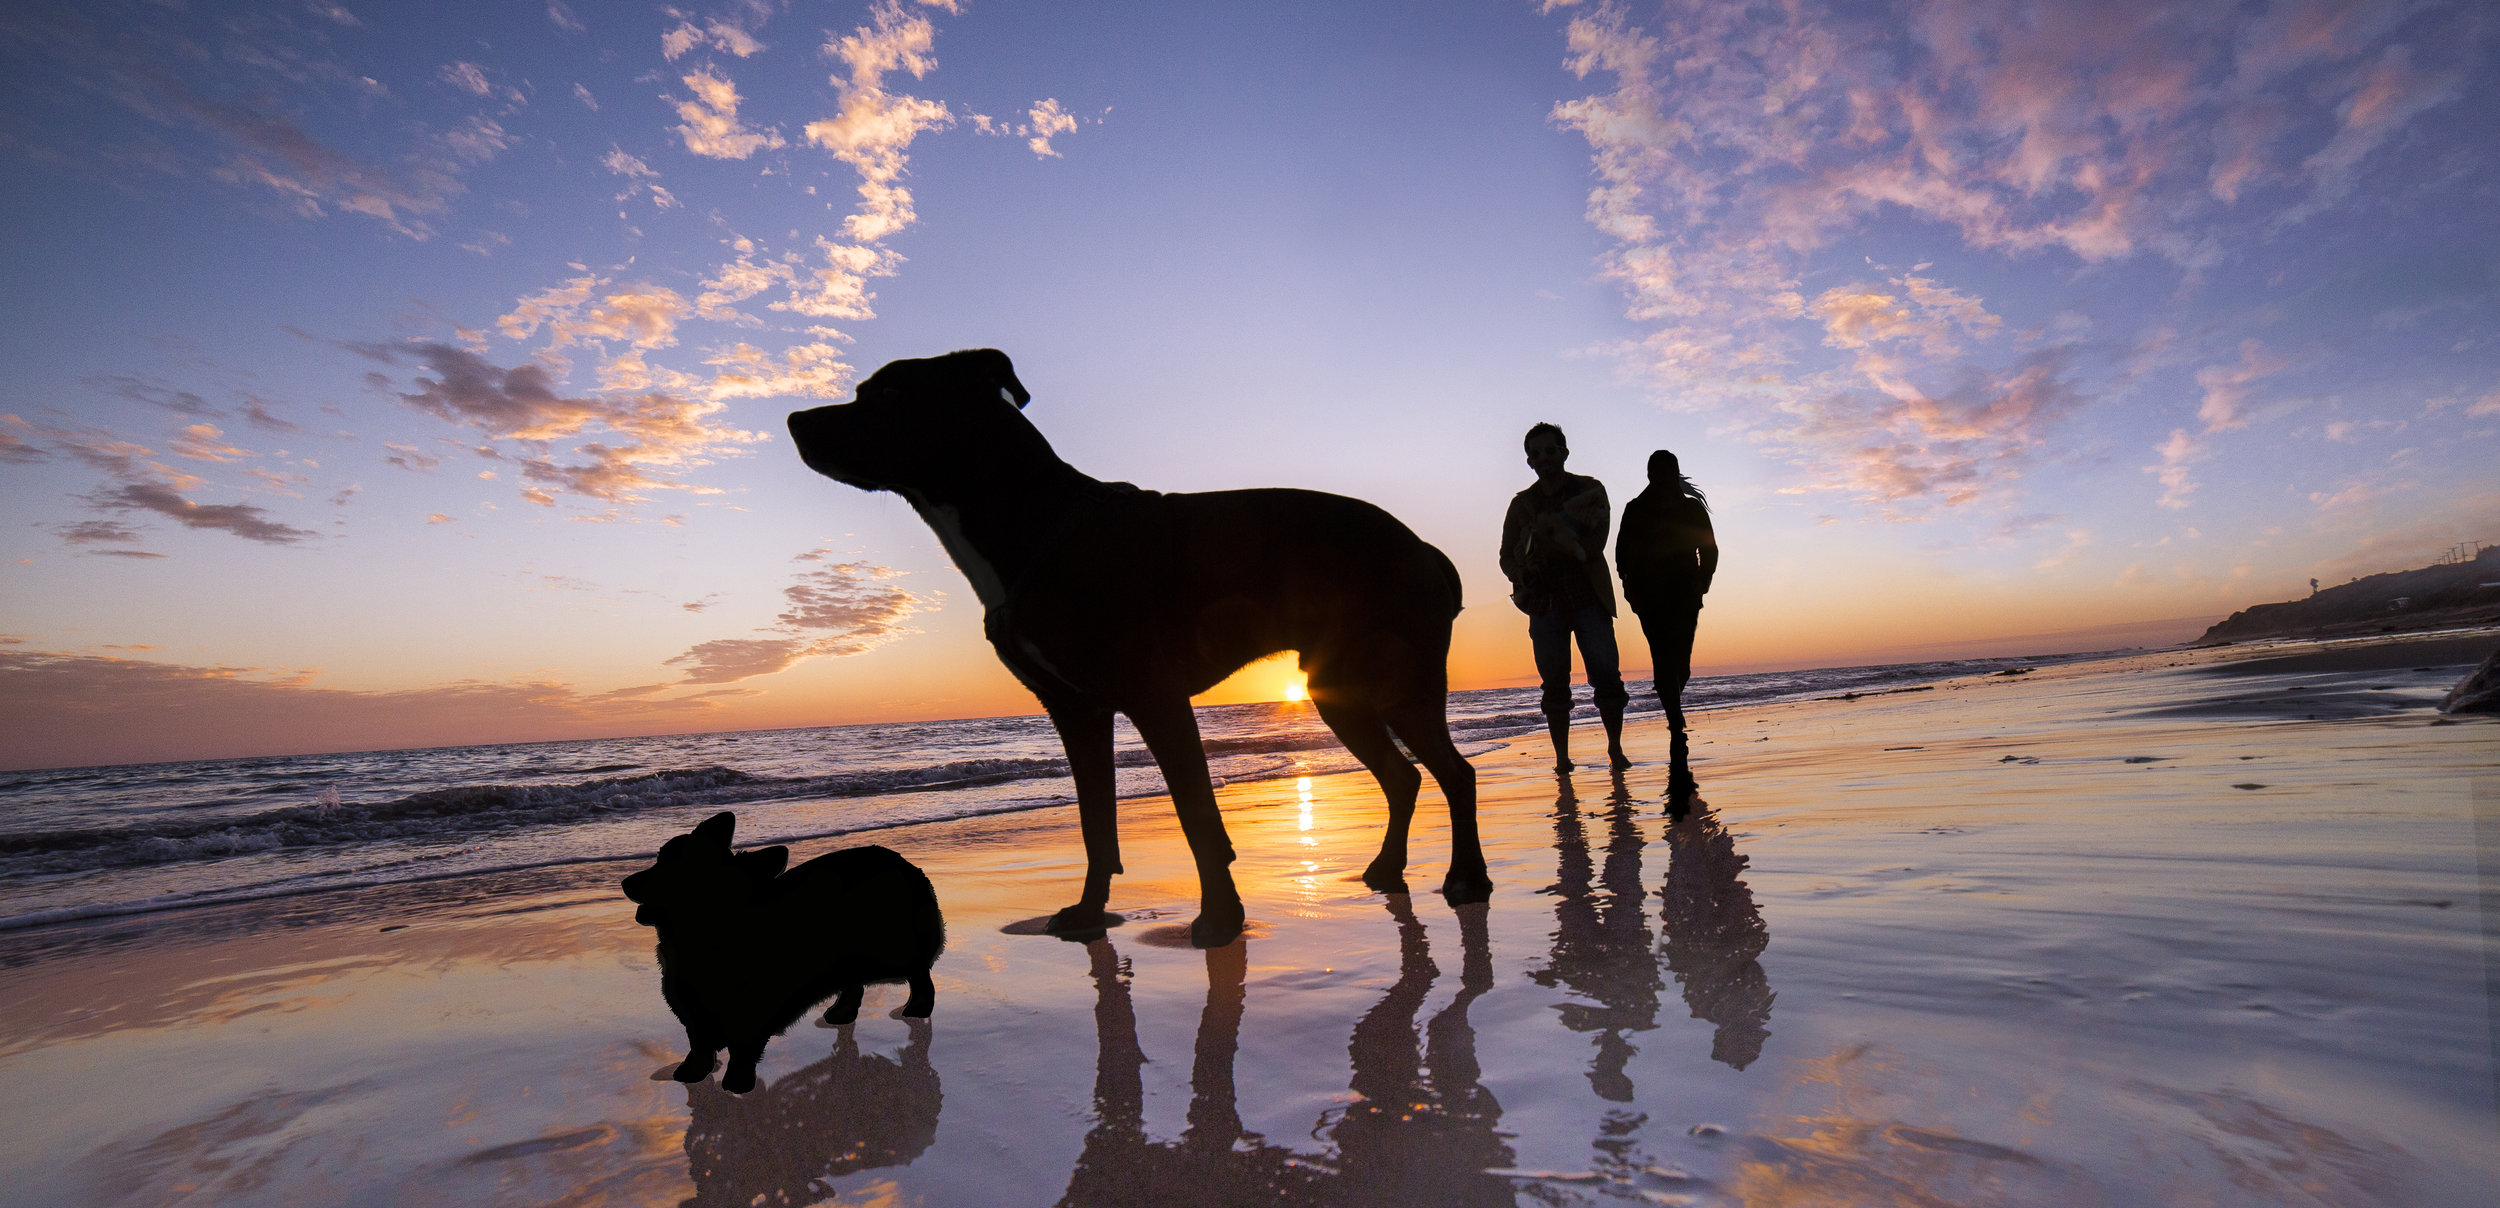 Kai silhouette leo carrillo phtsp.jpg